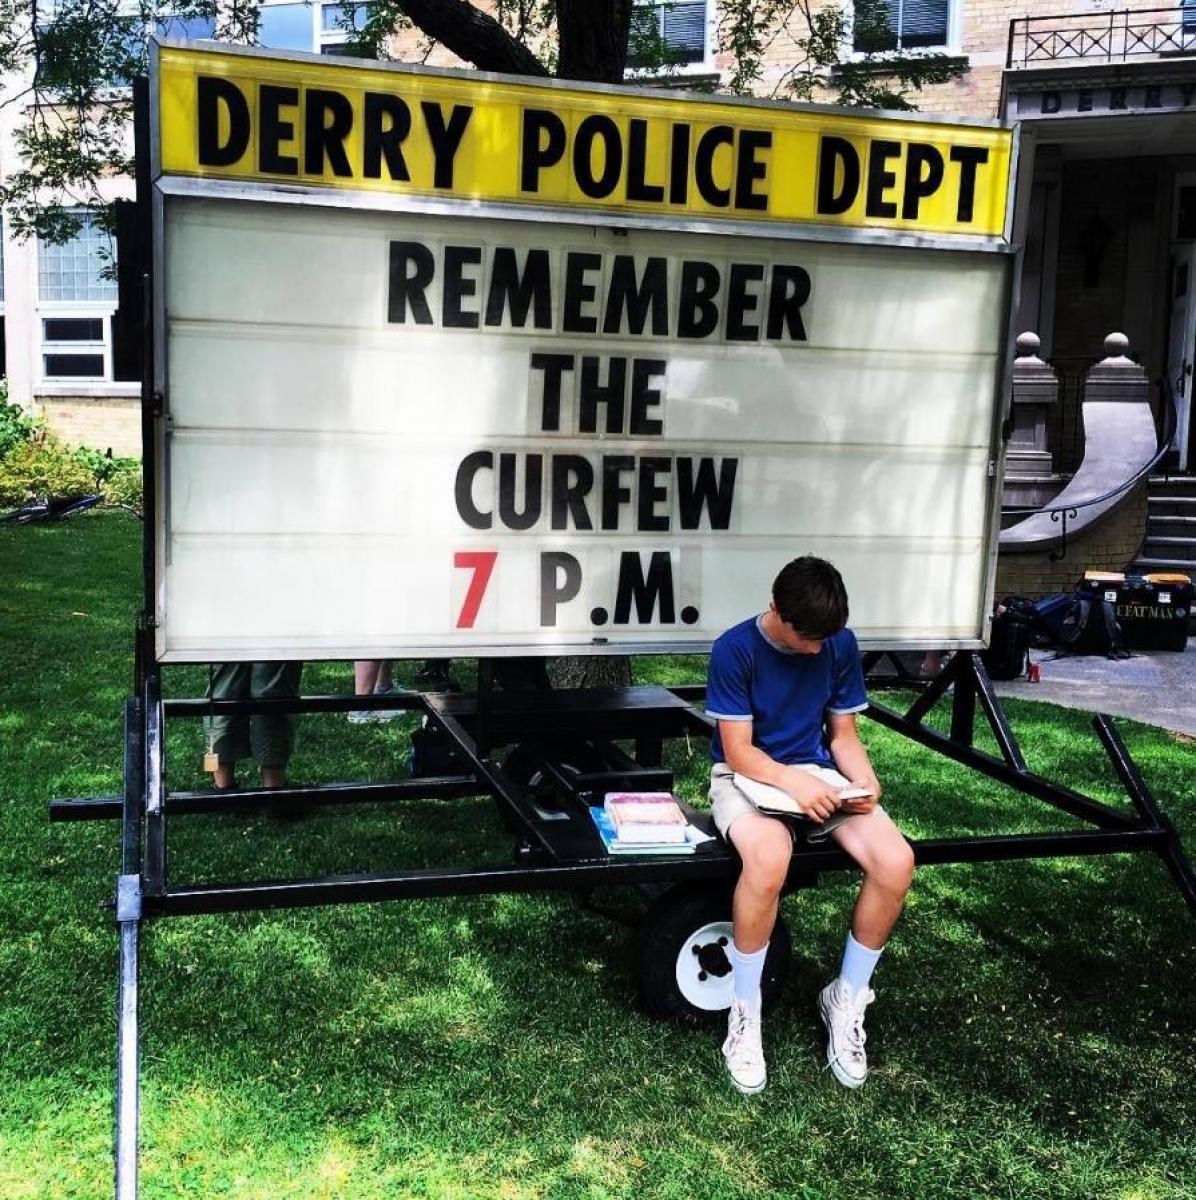 Derry Police Department - obrazek